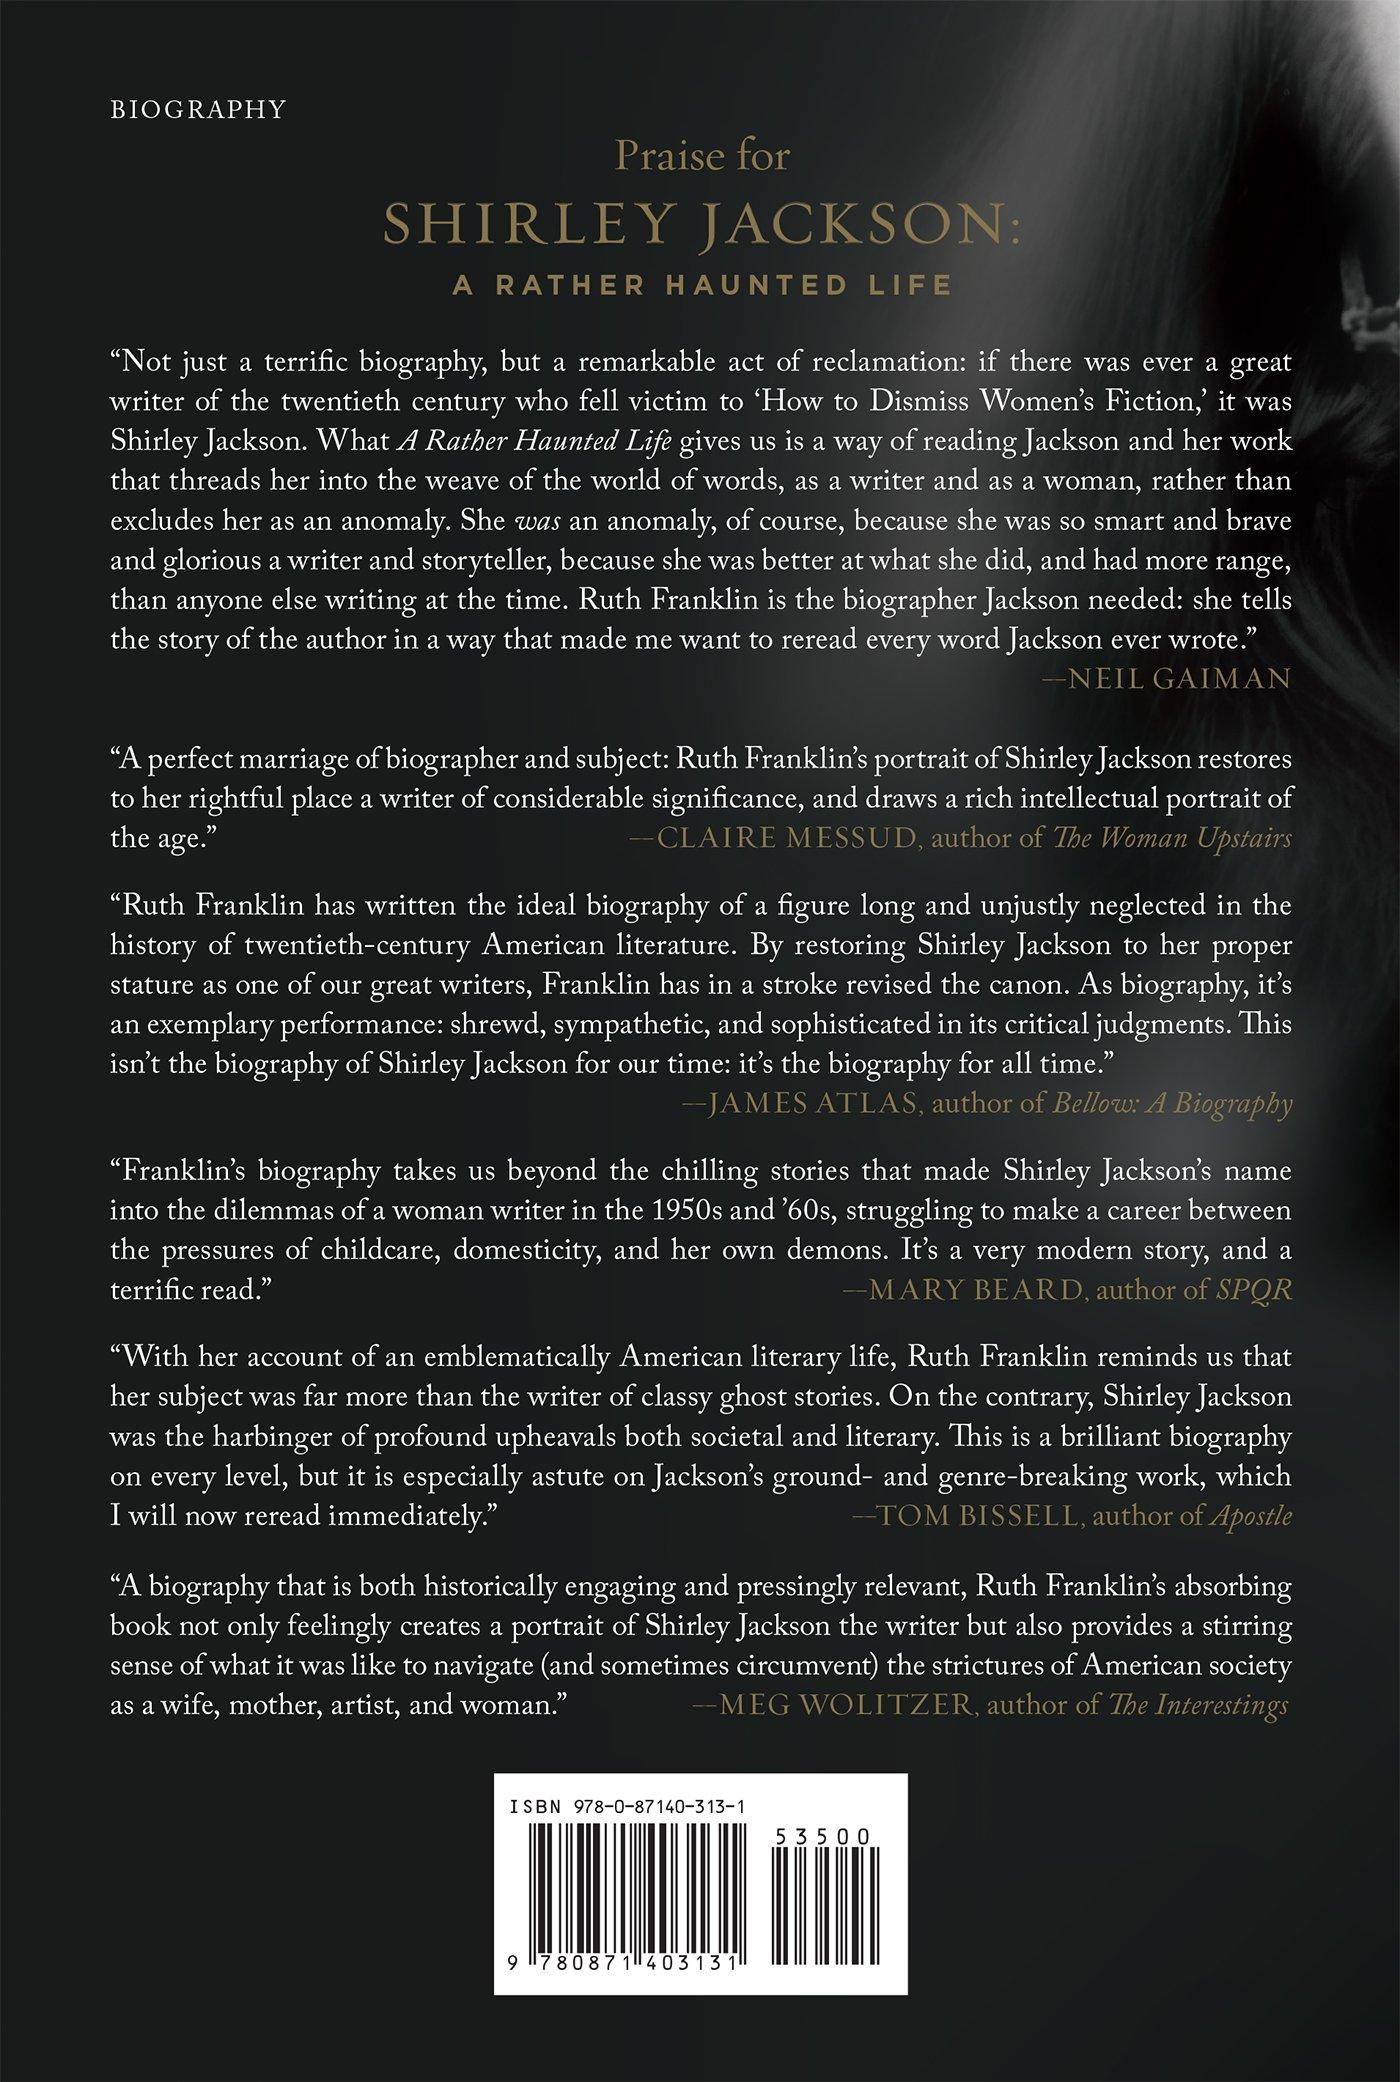 shirley jackson a rather haunted life ruth franklin shirley jackson a rather haunted life ruth franklin 9780871403131 amazon com books